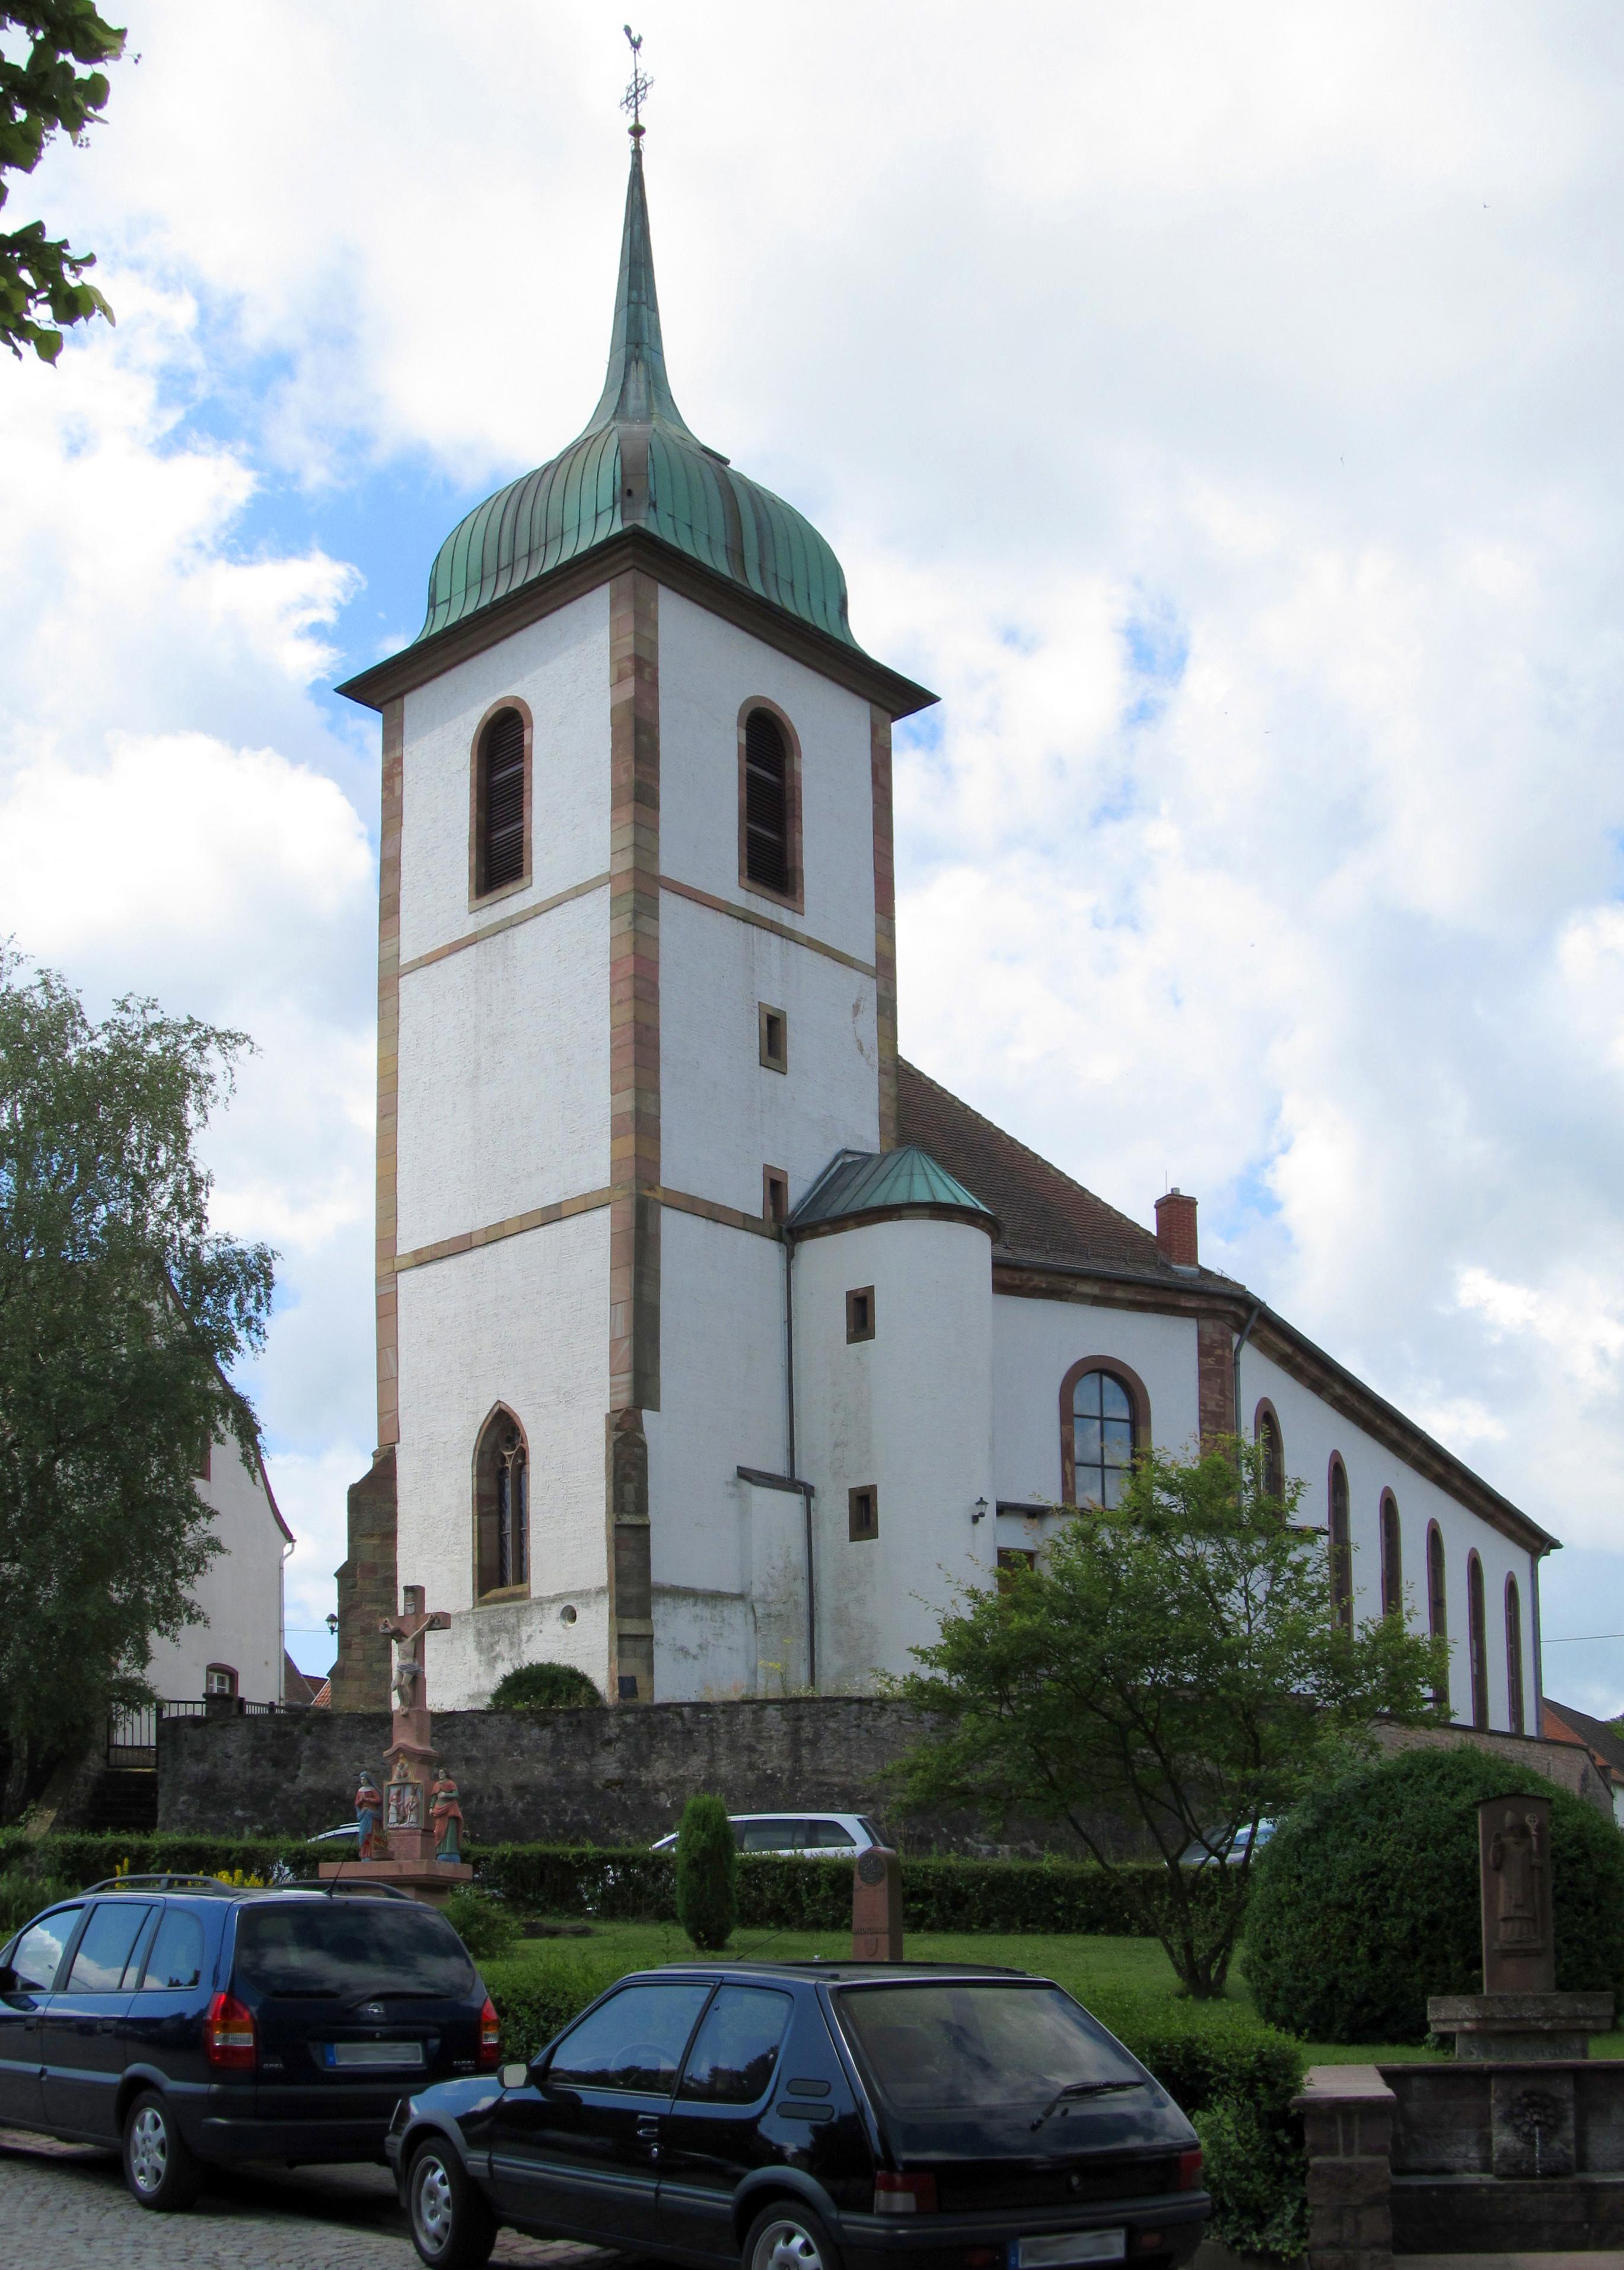 Medelsheim